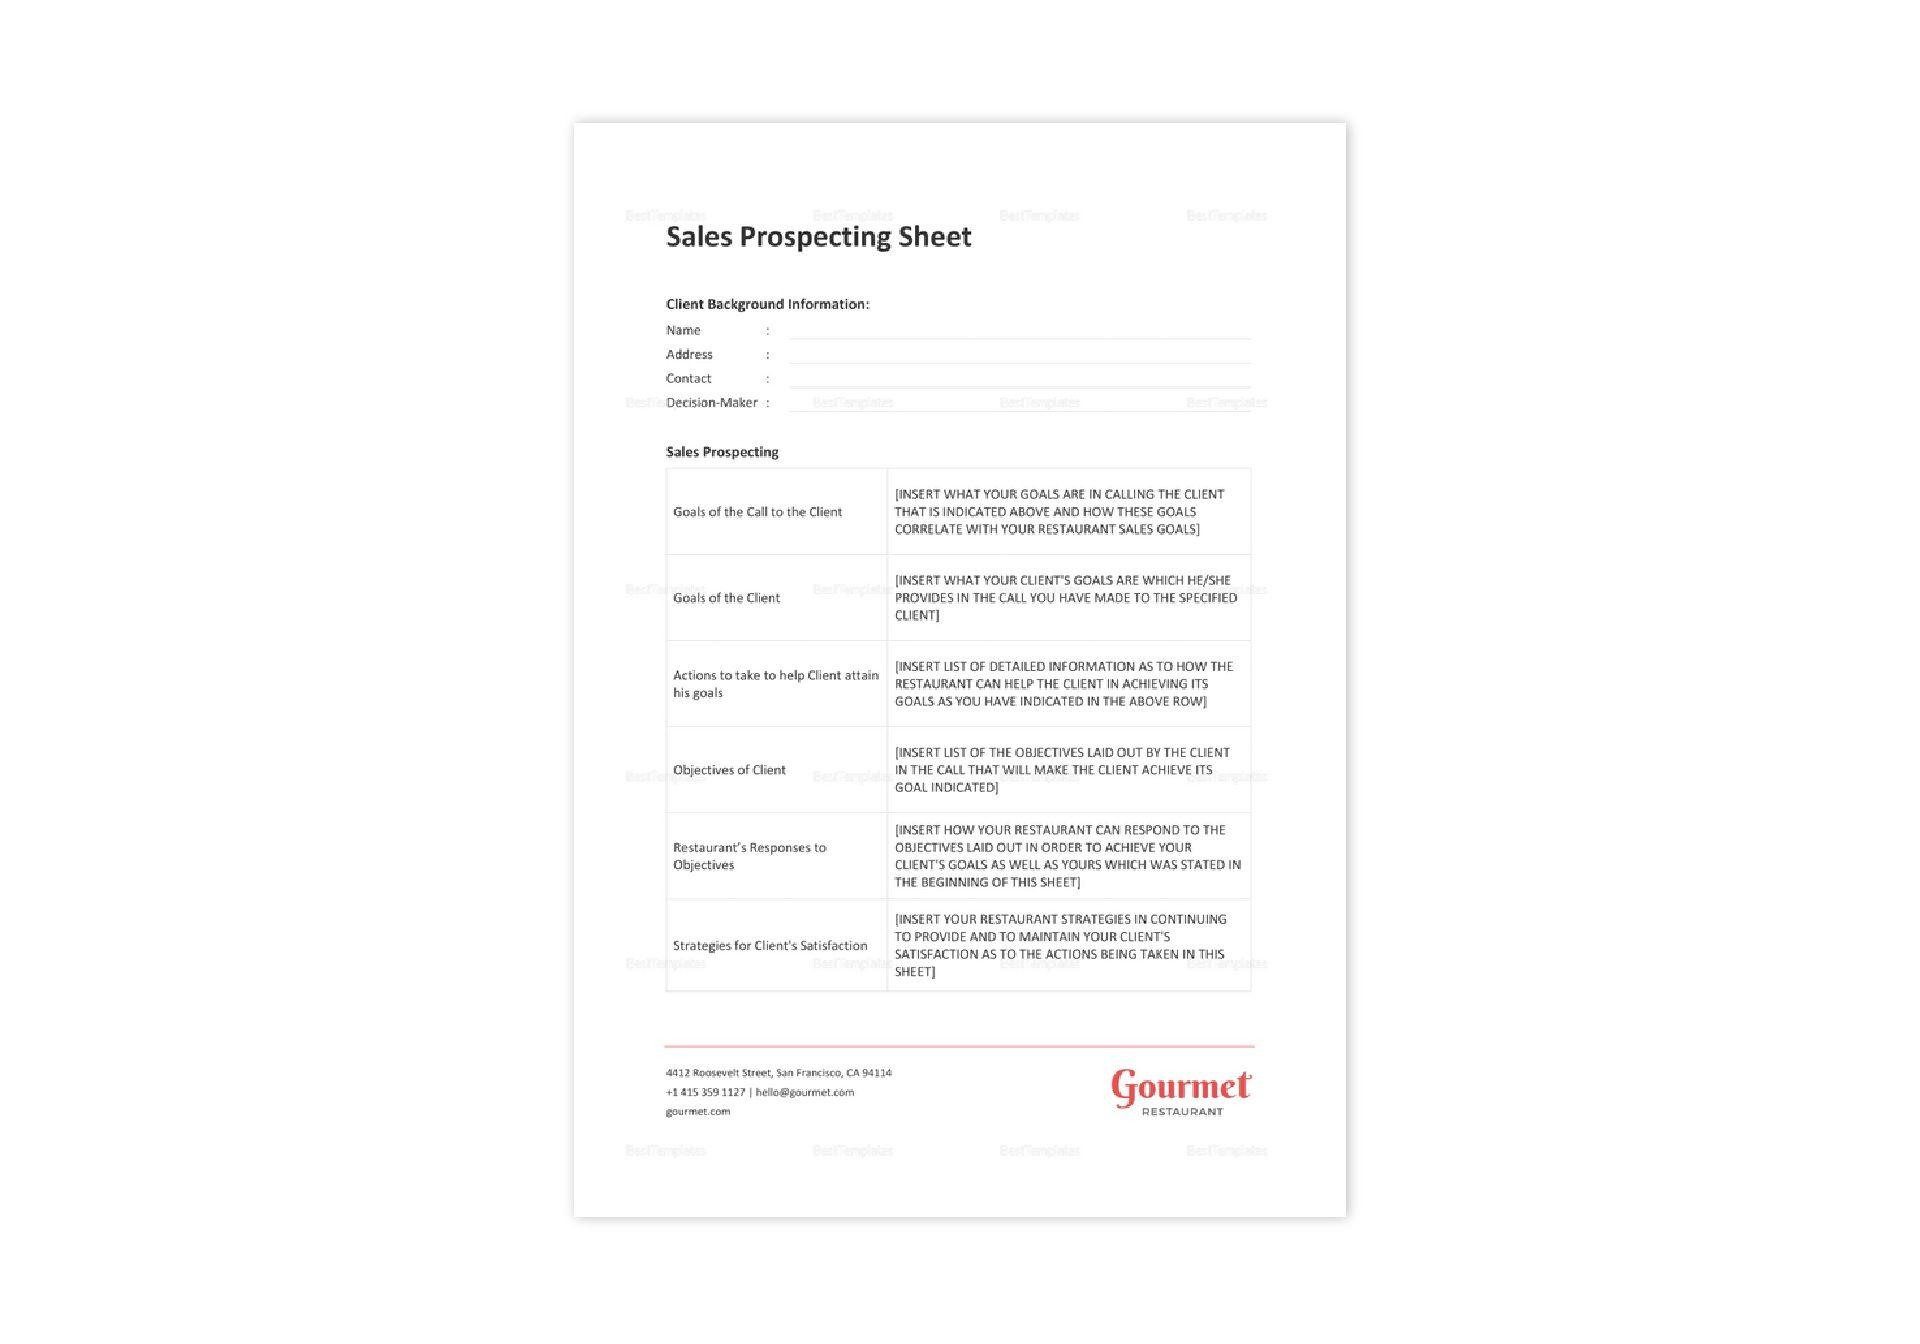 Sales Prospecting Spreadsheet Templates Inside Restaurant Sales Prospecting Sheet Template In Word, Excel, Apple